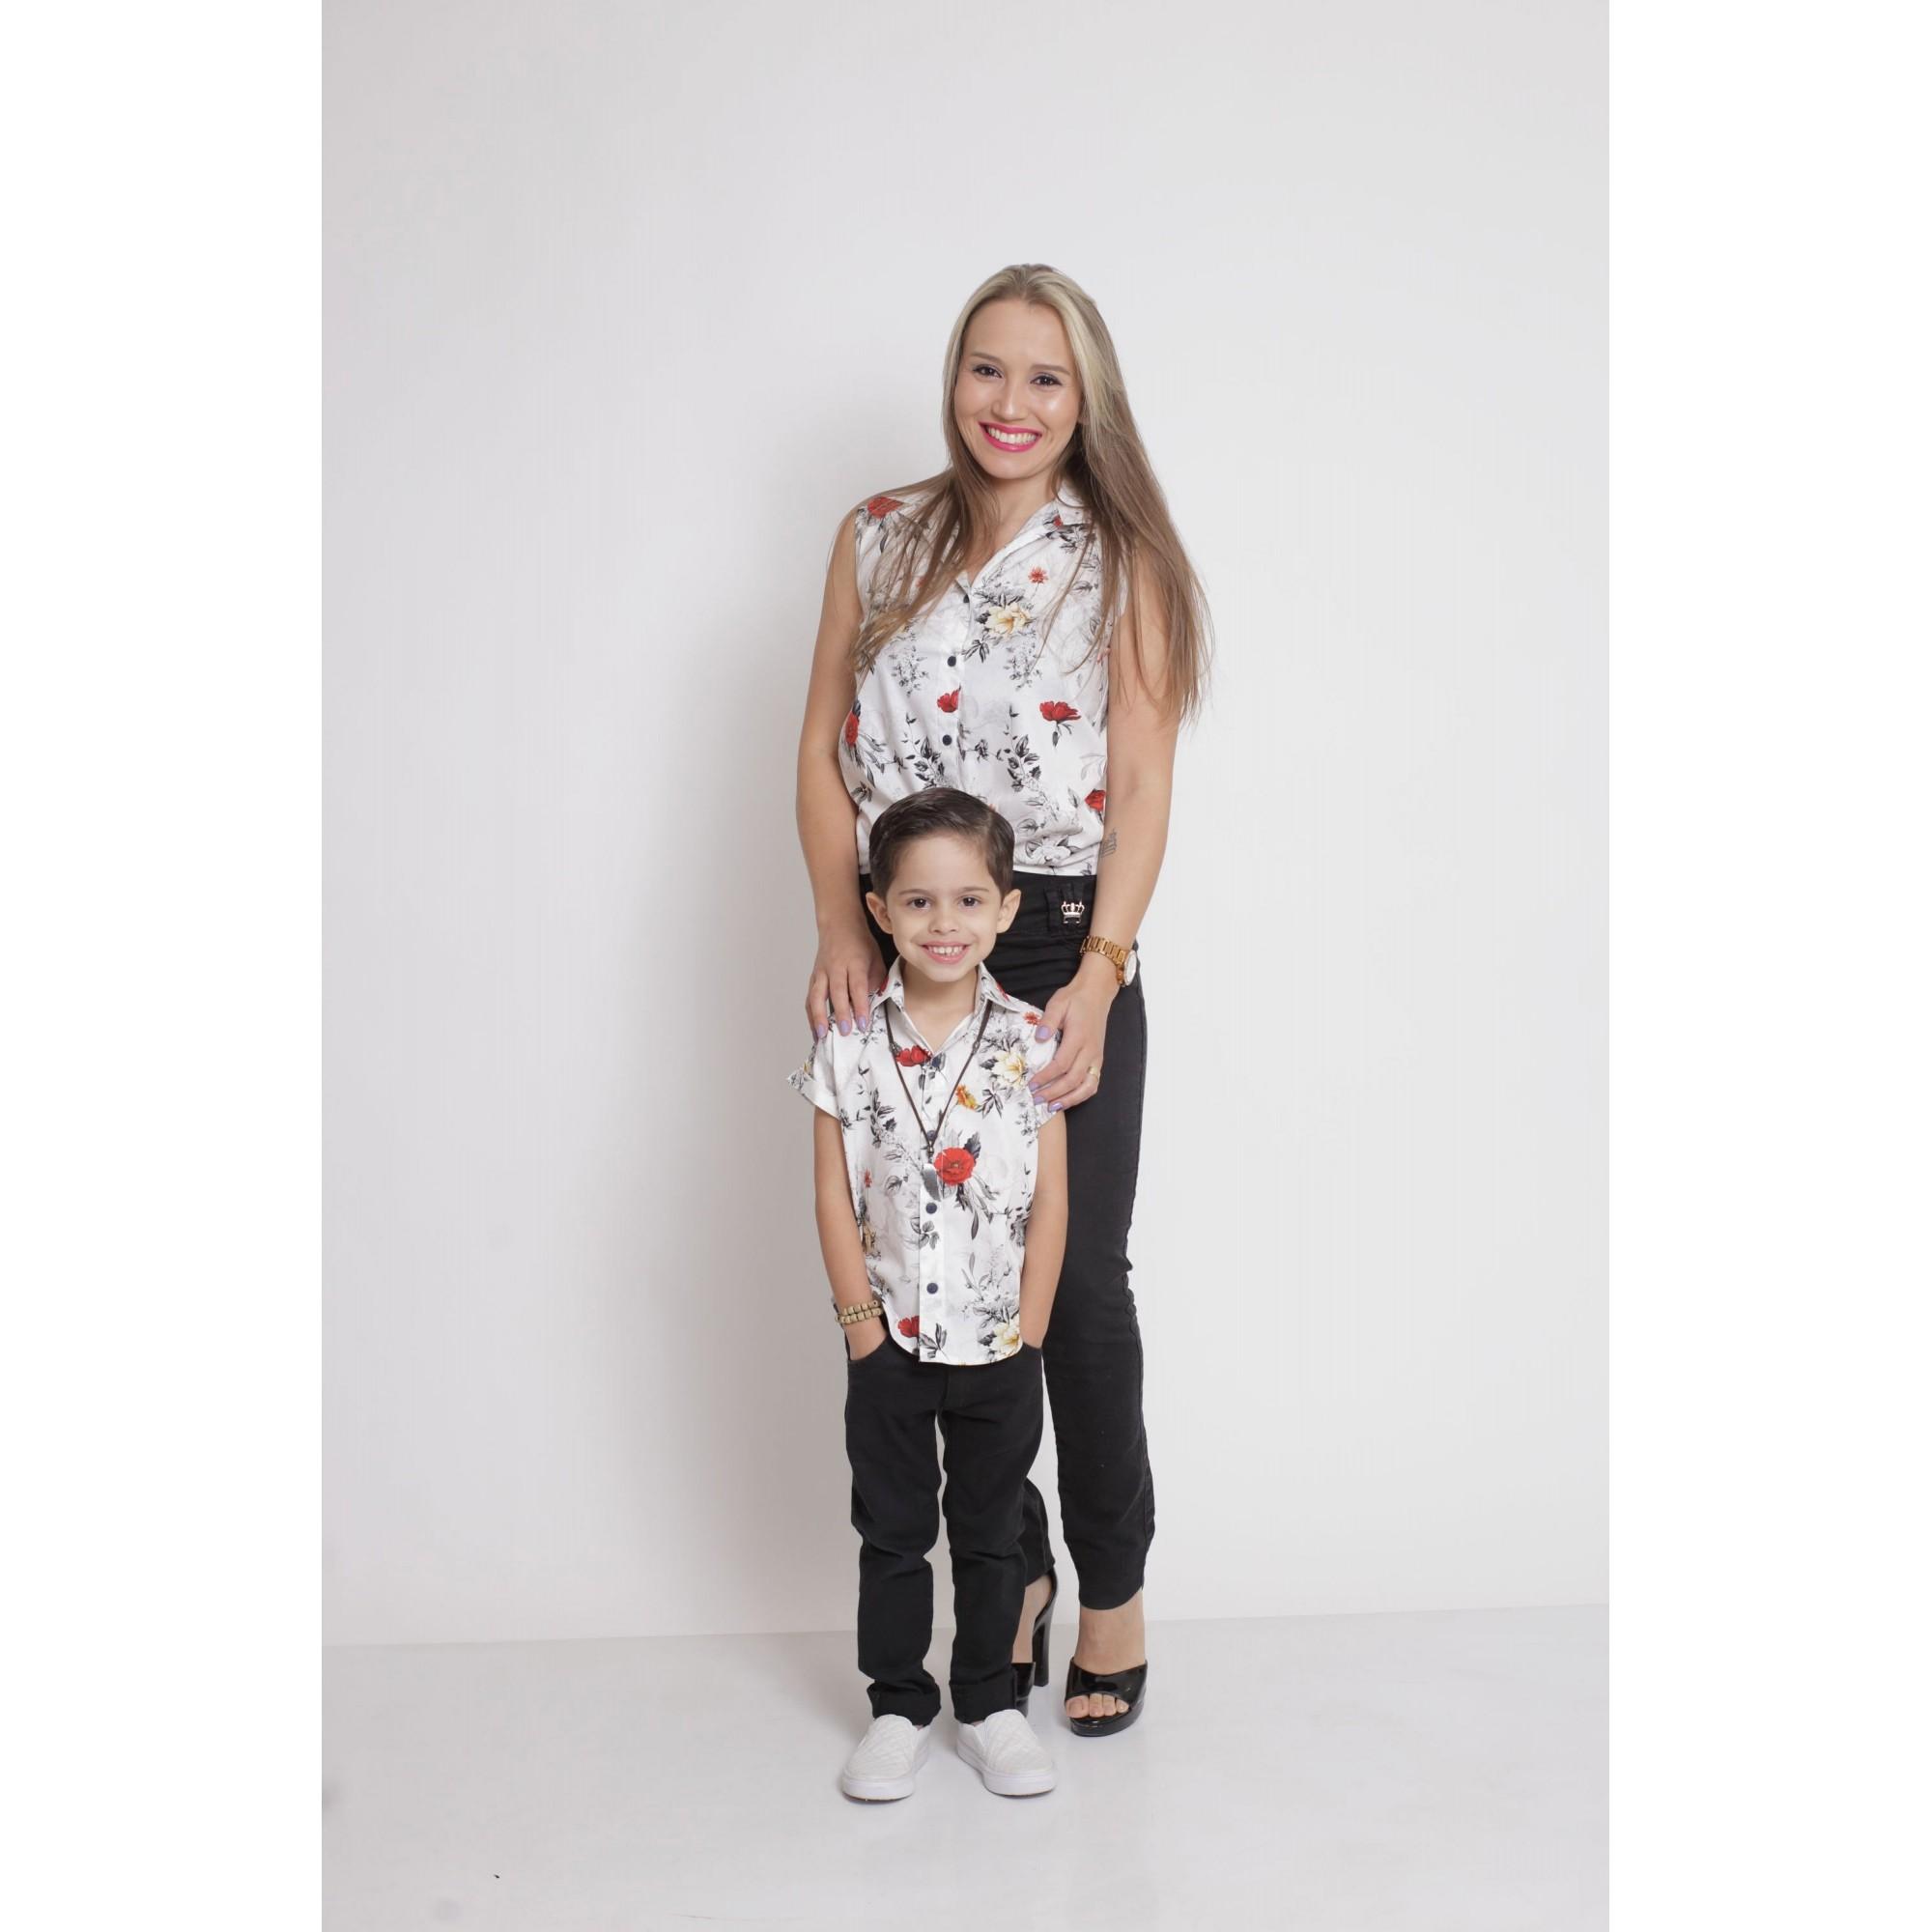 MÃE E FILHO > Kit 02 Camisas Social - Adulto + Infantil Branca Floral [Coleção Tal Mãe Tal Filho]